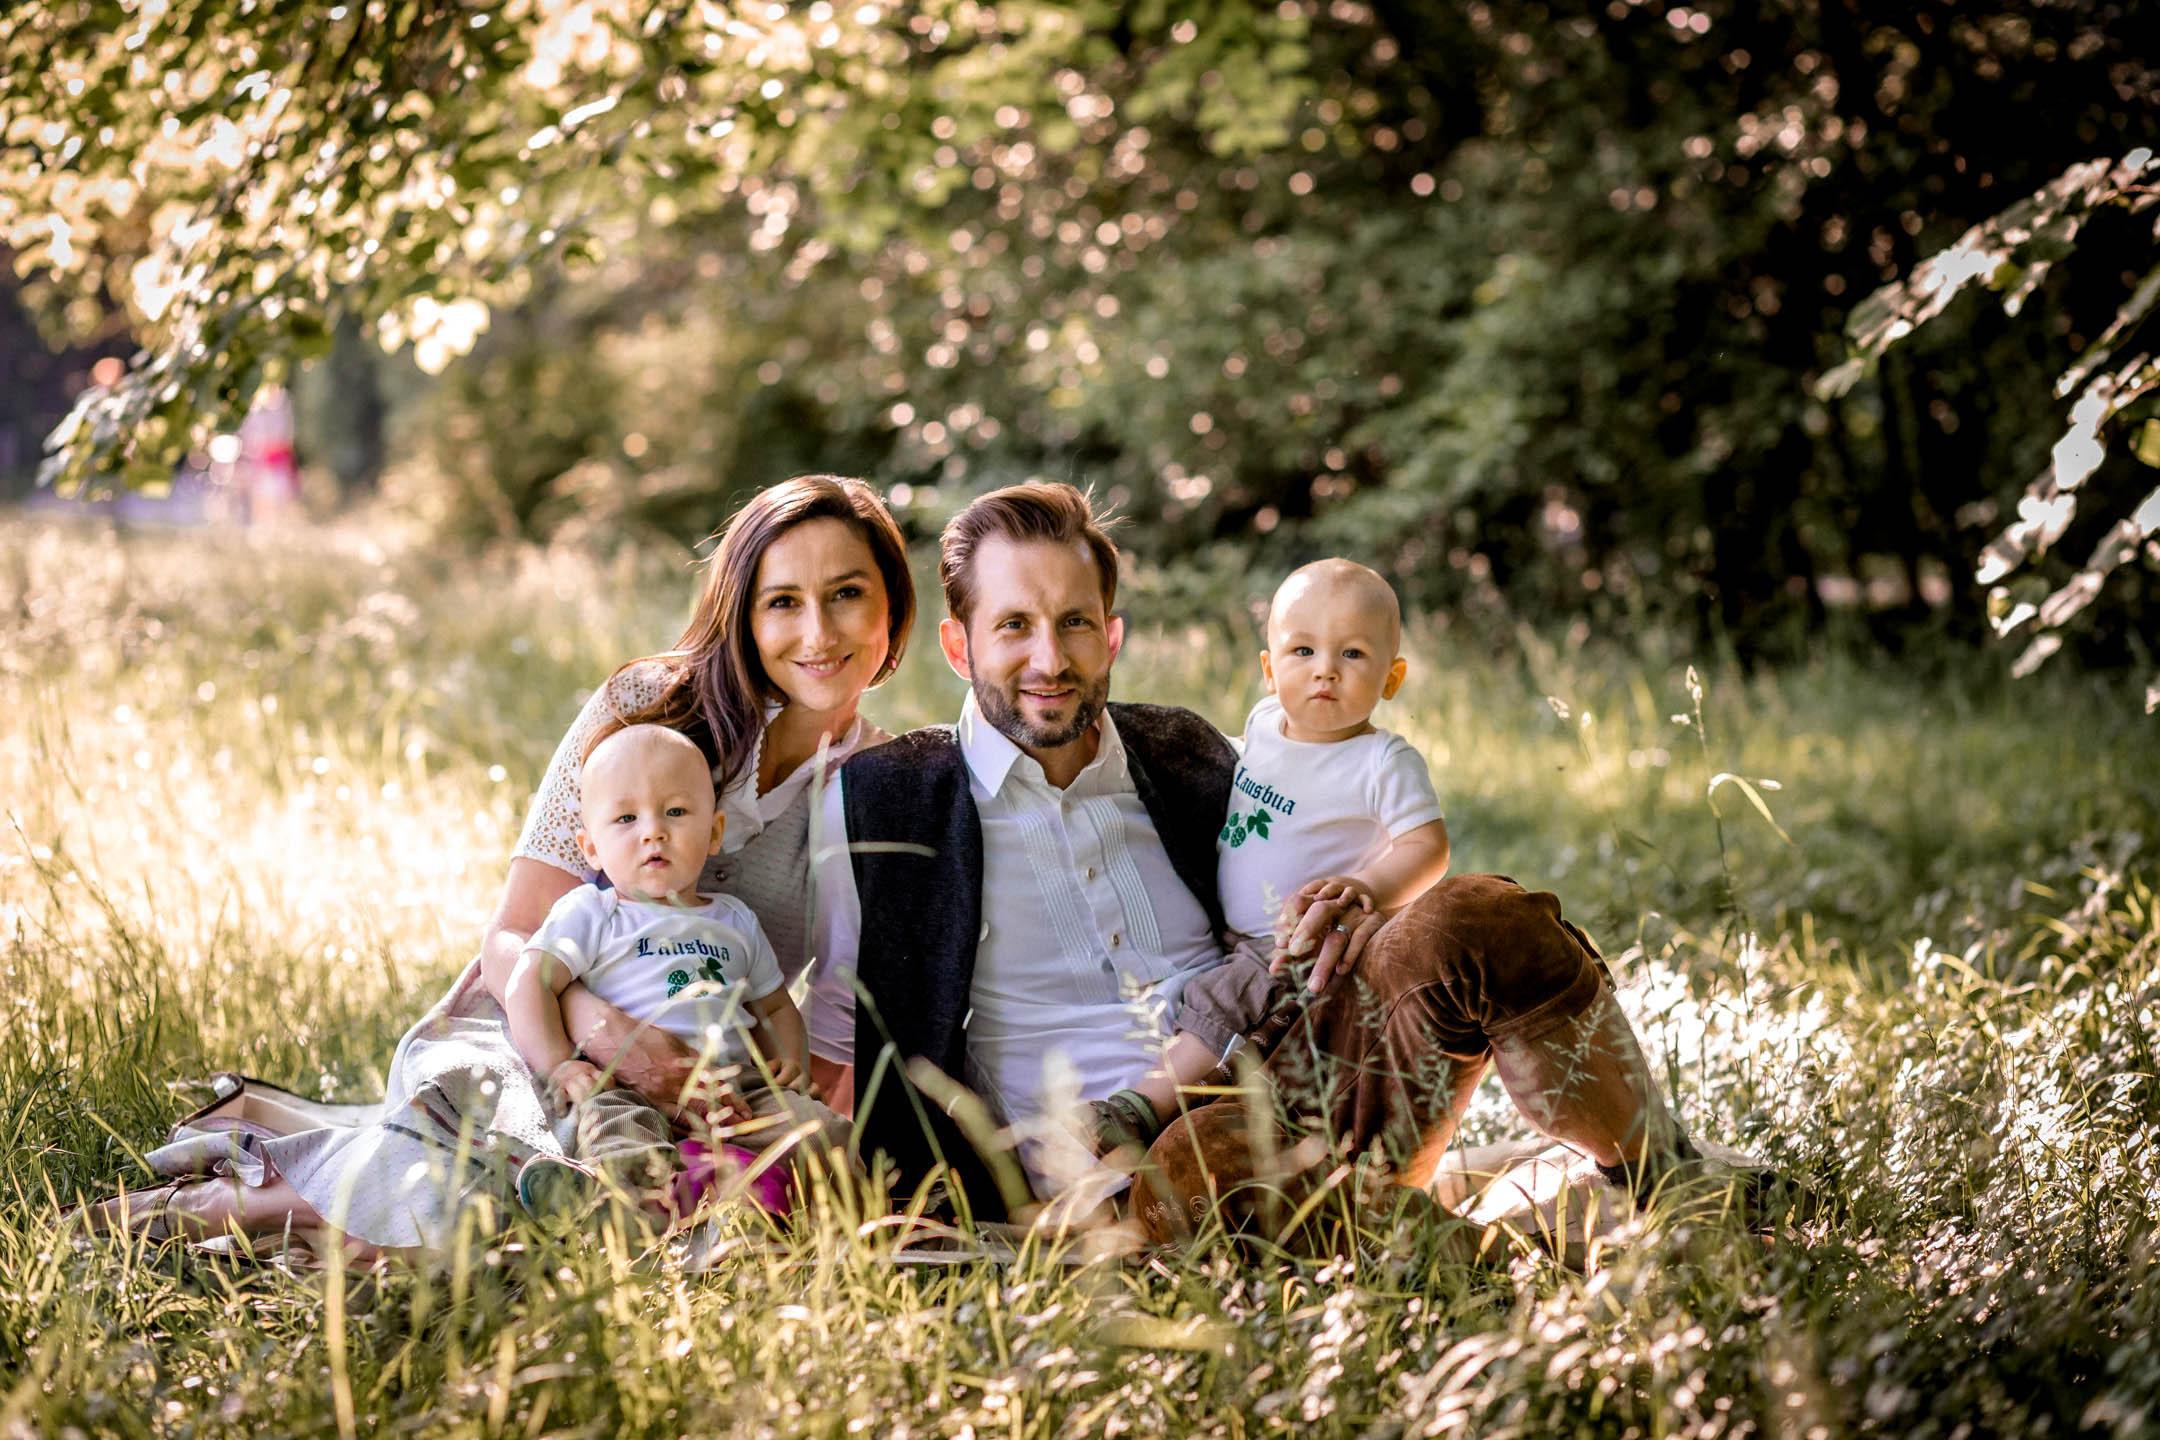 Familienfotografie München Anja Richter Fotografie-5643